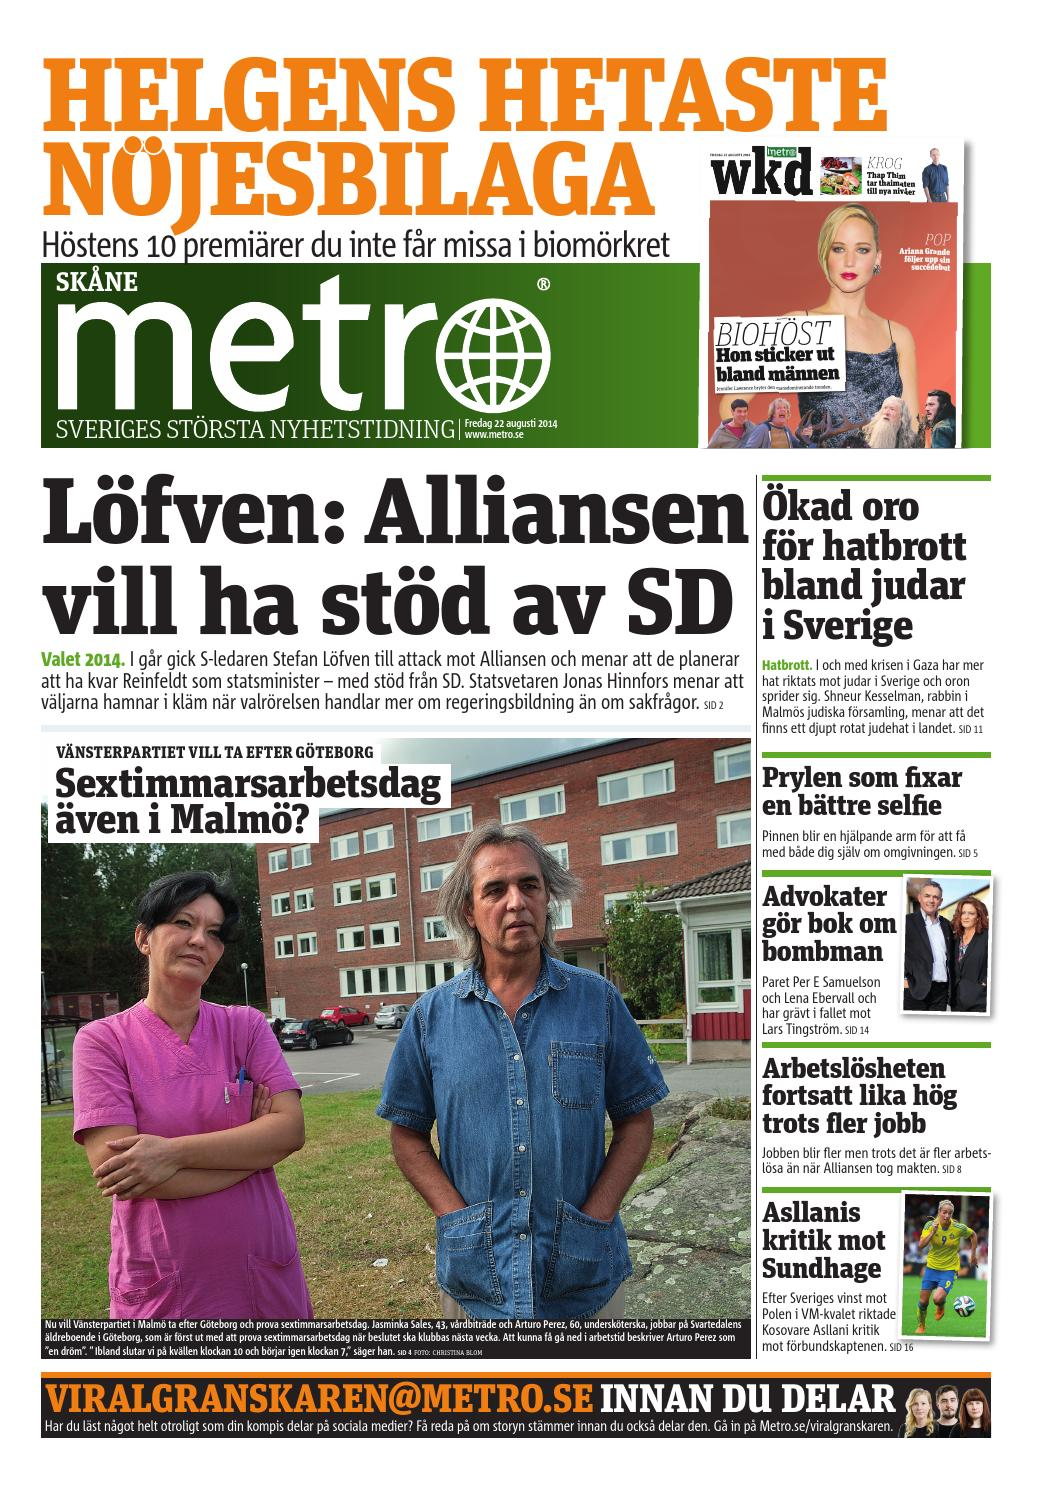 Reinfeldt spar pa lettlandskritik